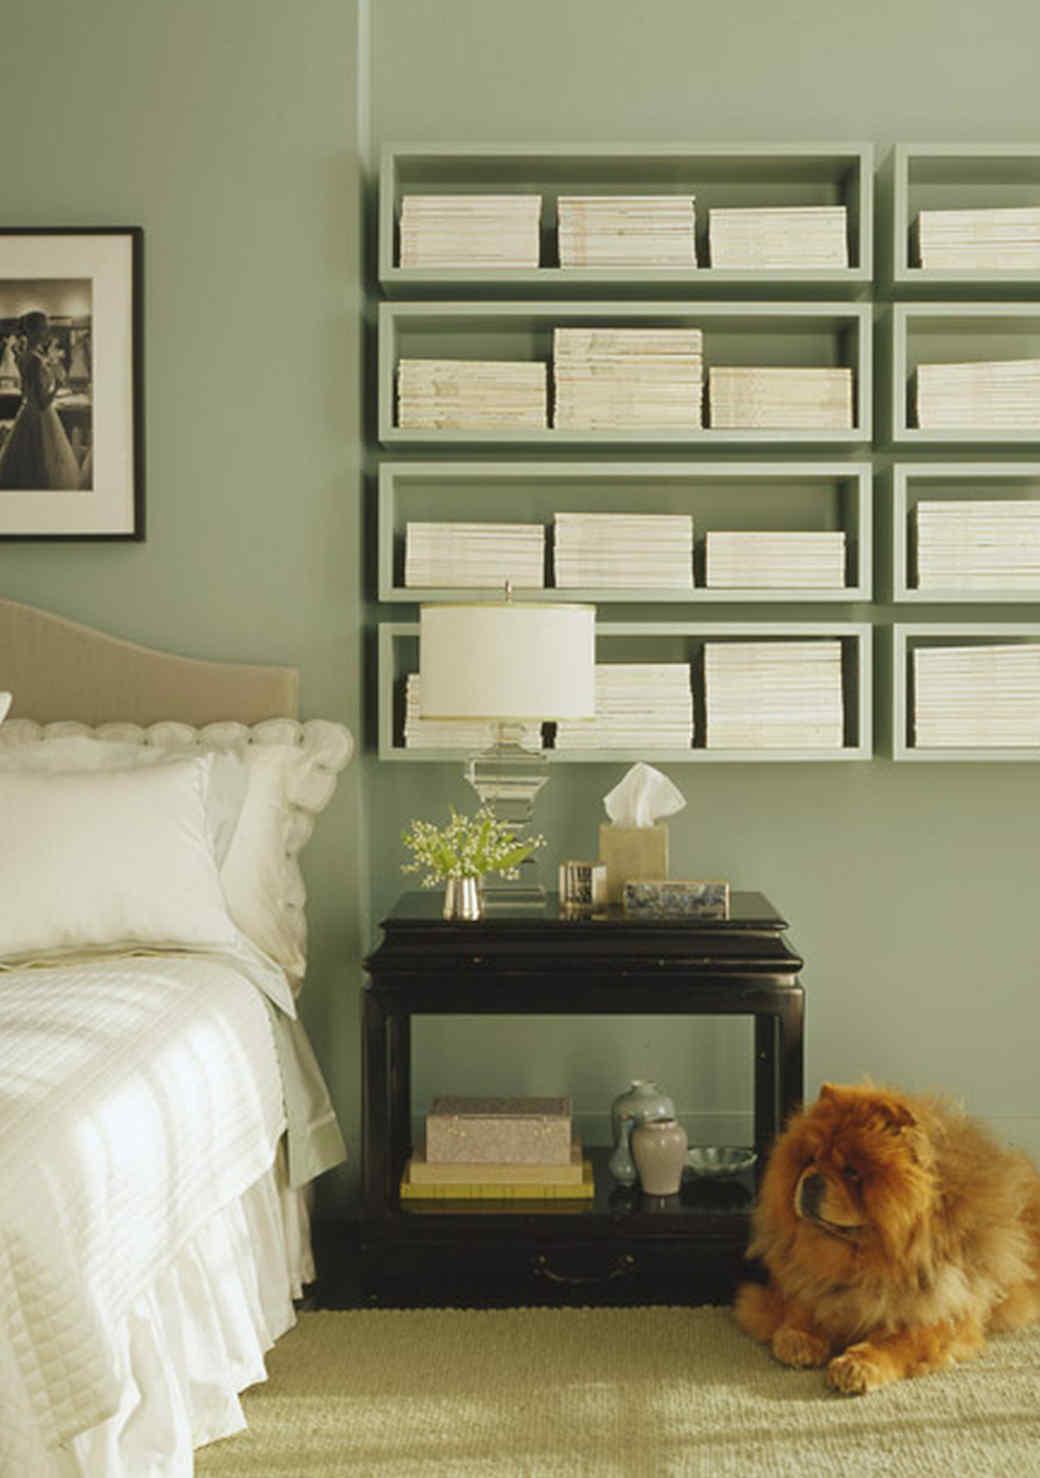 green-bedroom-1016.jpg (skyword:349515)